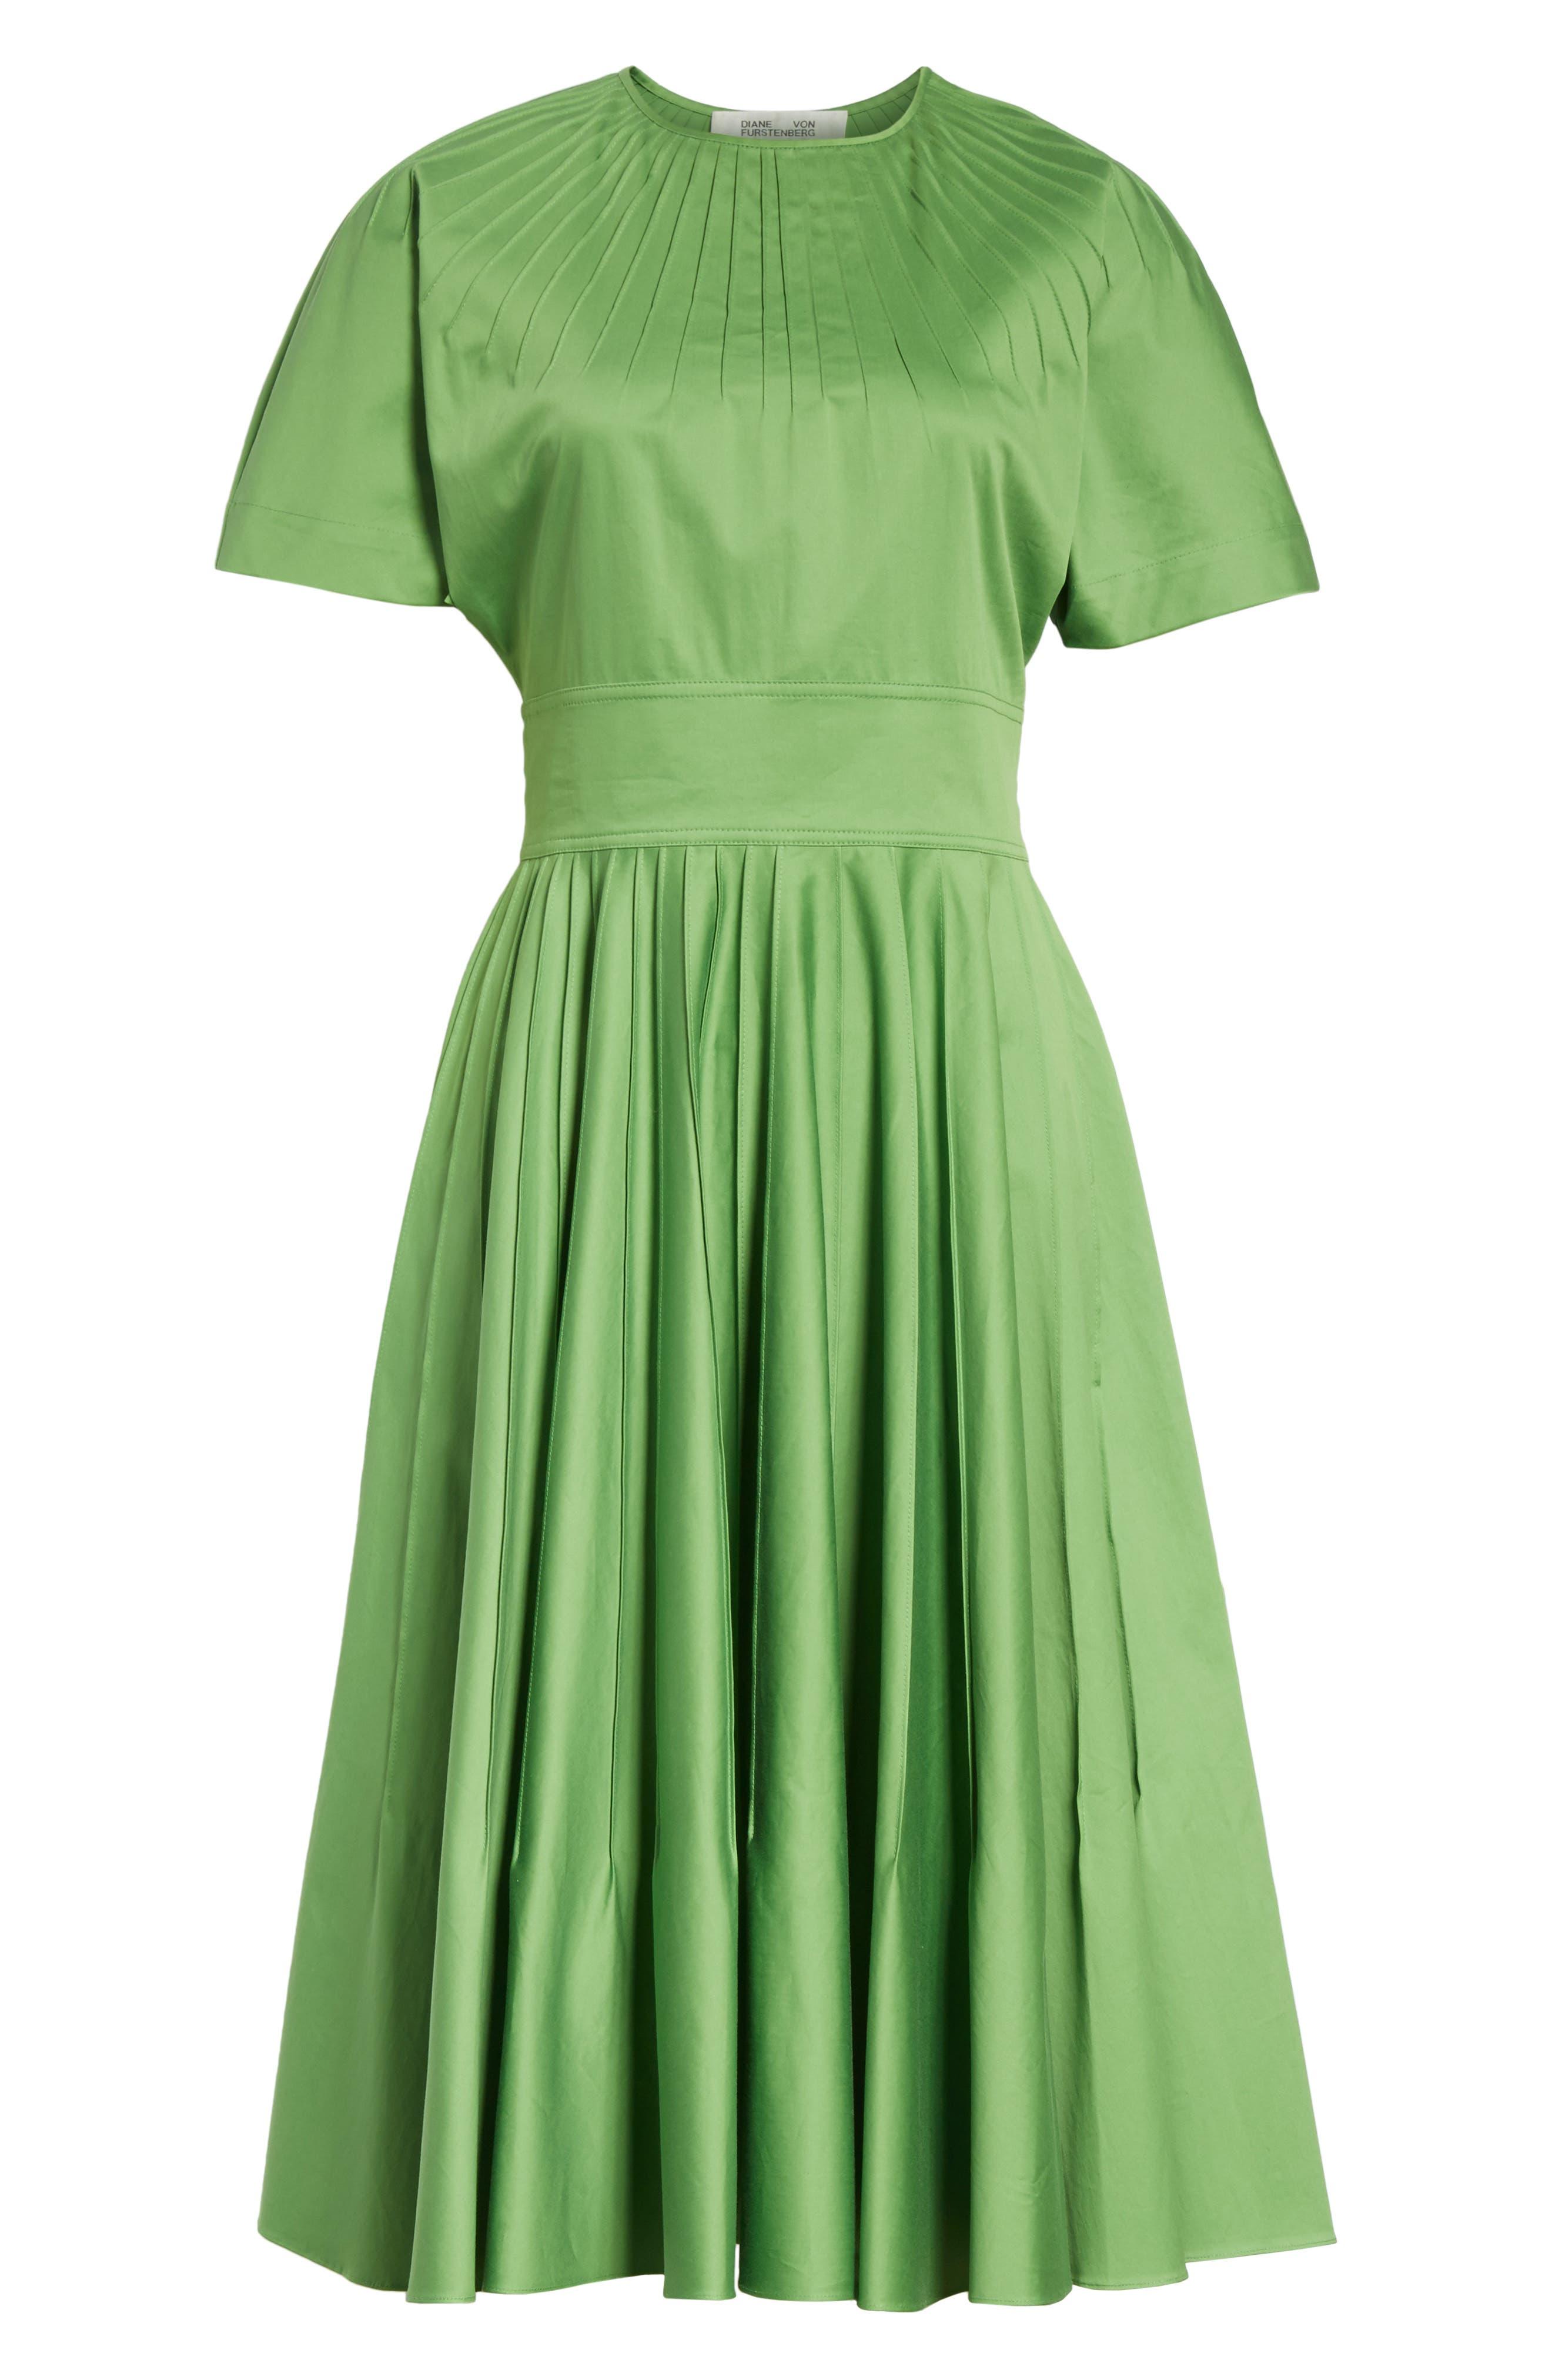 Diane von Furstenberg Pintuck Dress,                             Alternate thumbnail 6, color,                             315